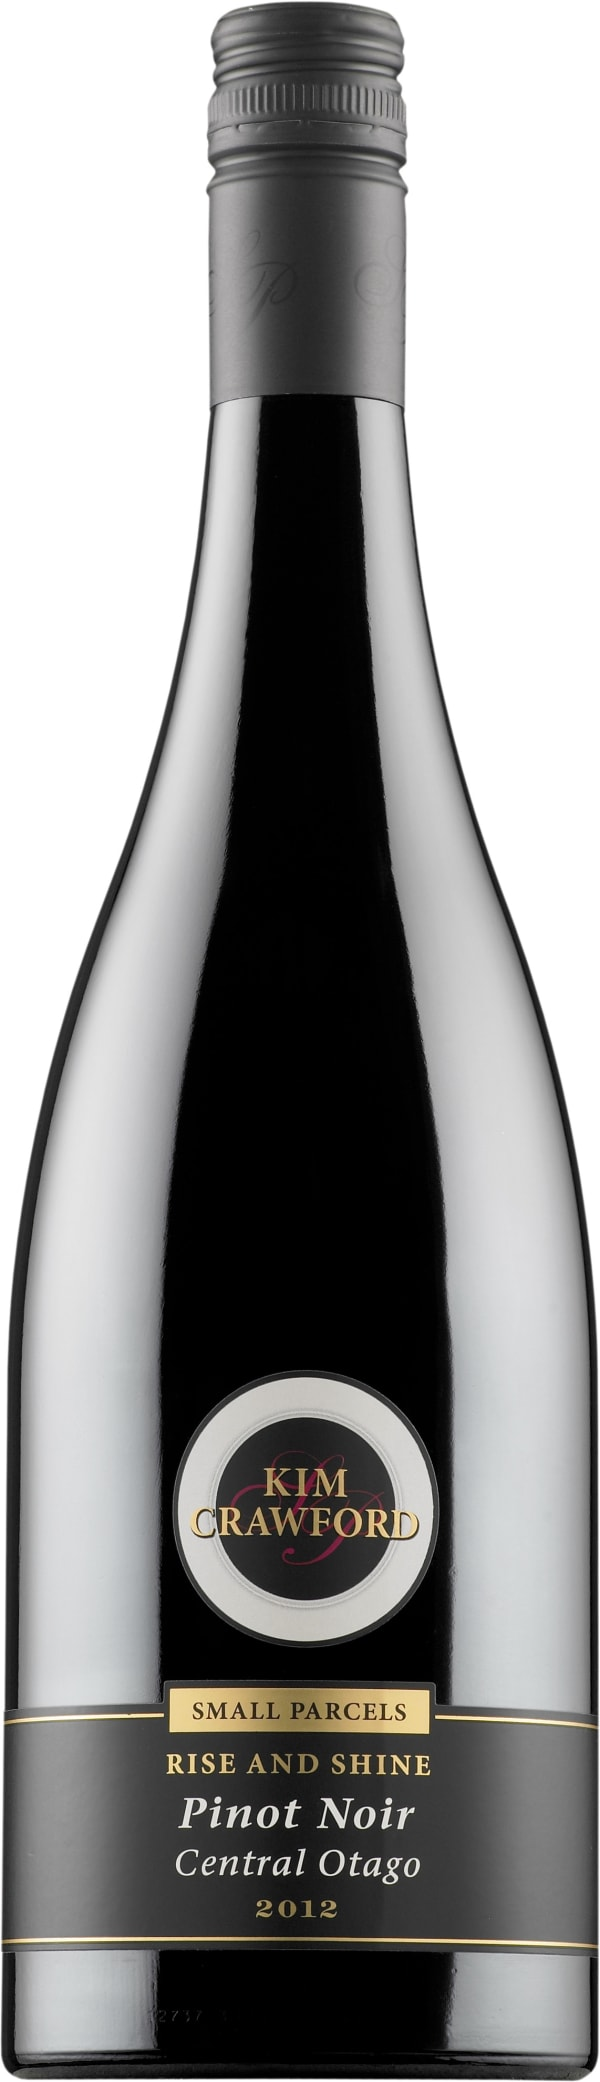 Kim Crawford Rise and Shine Pinot Noir 2013